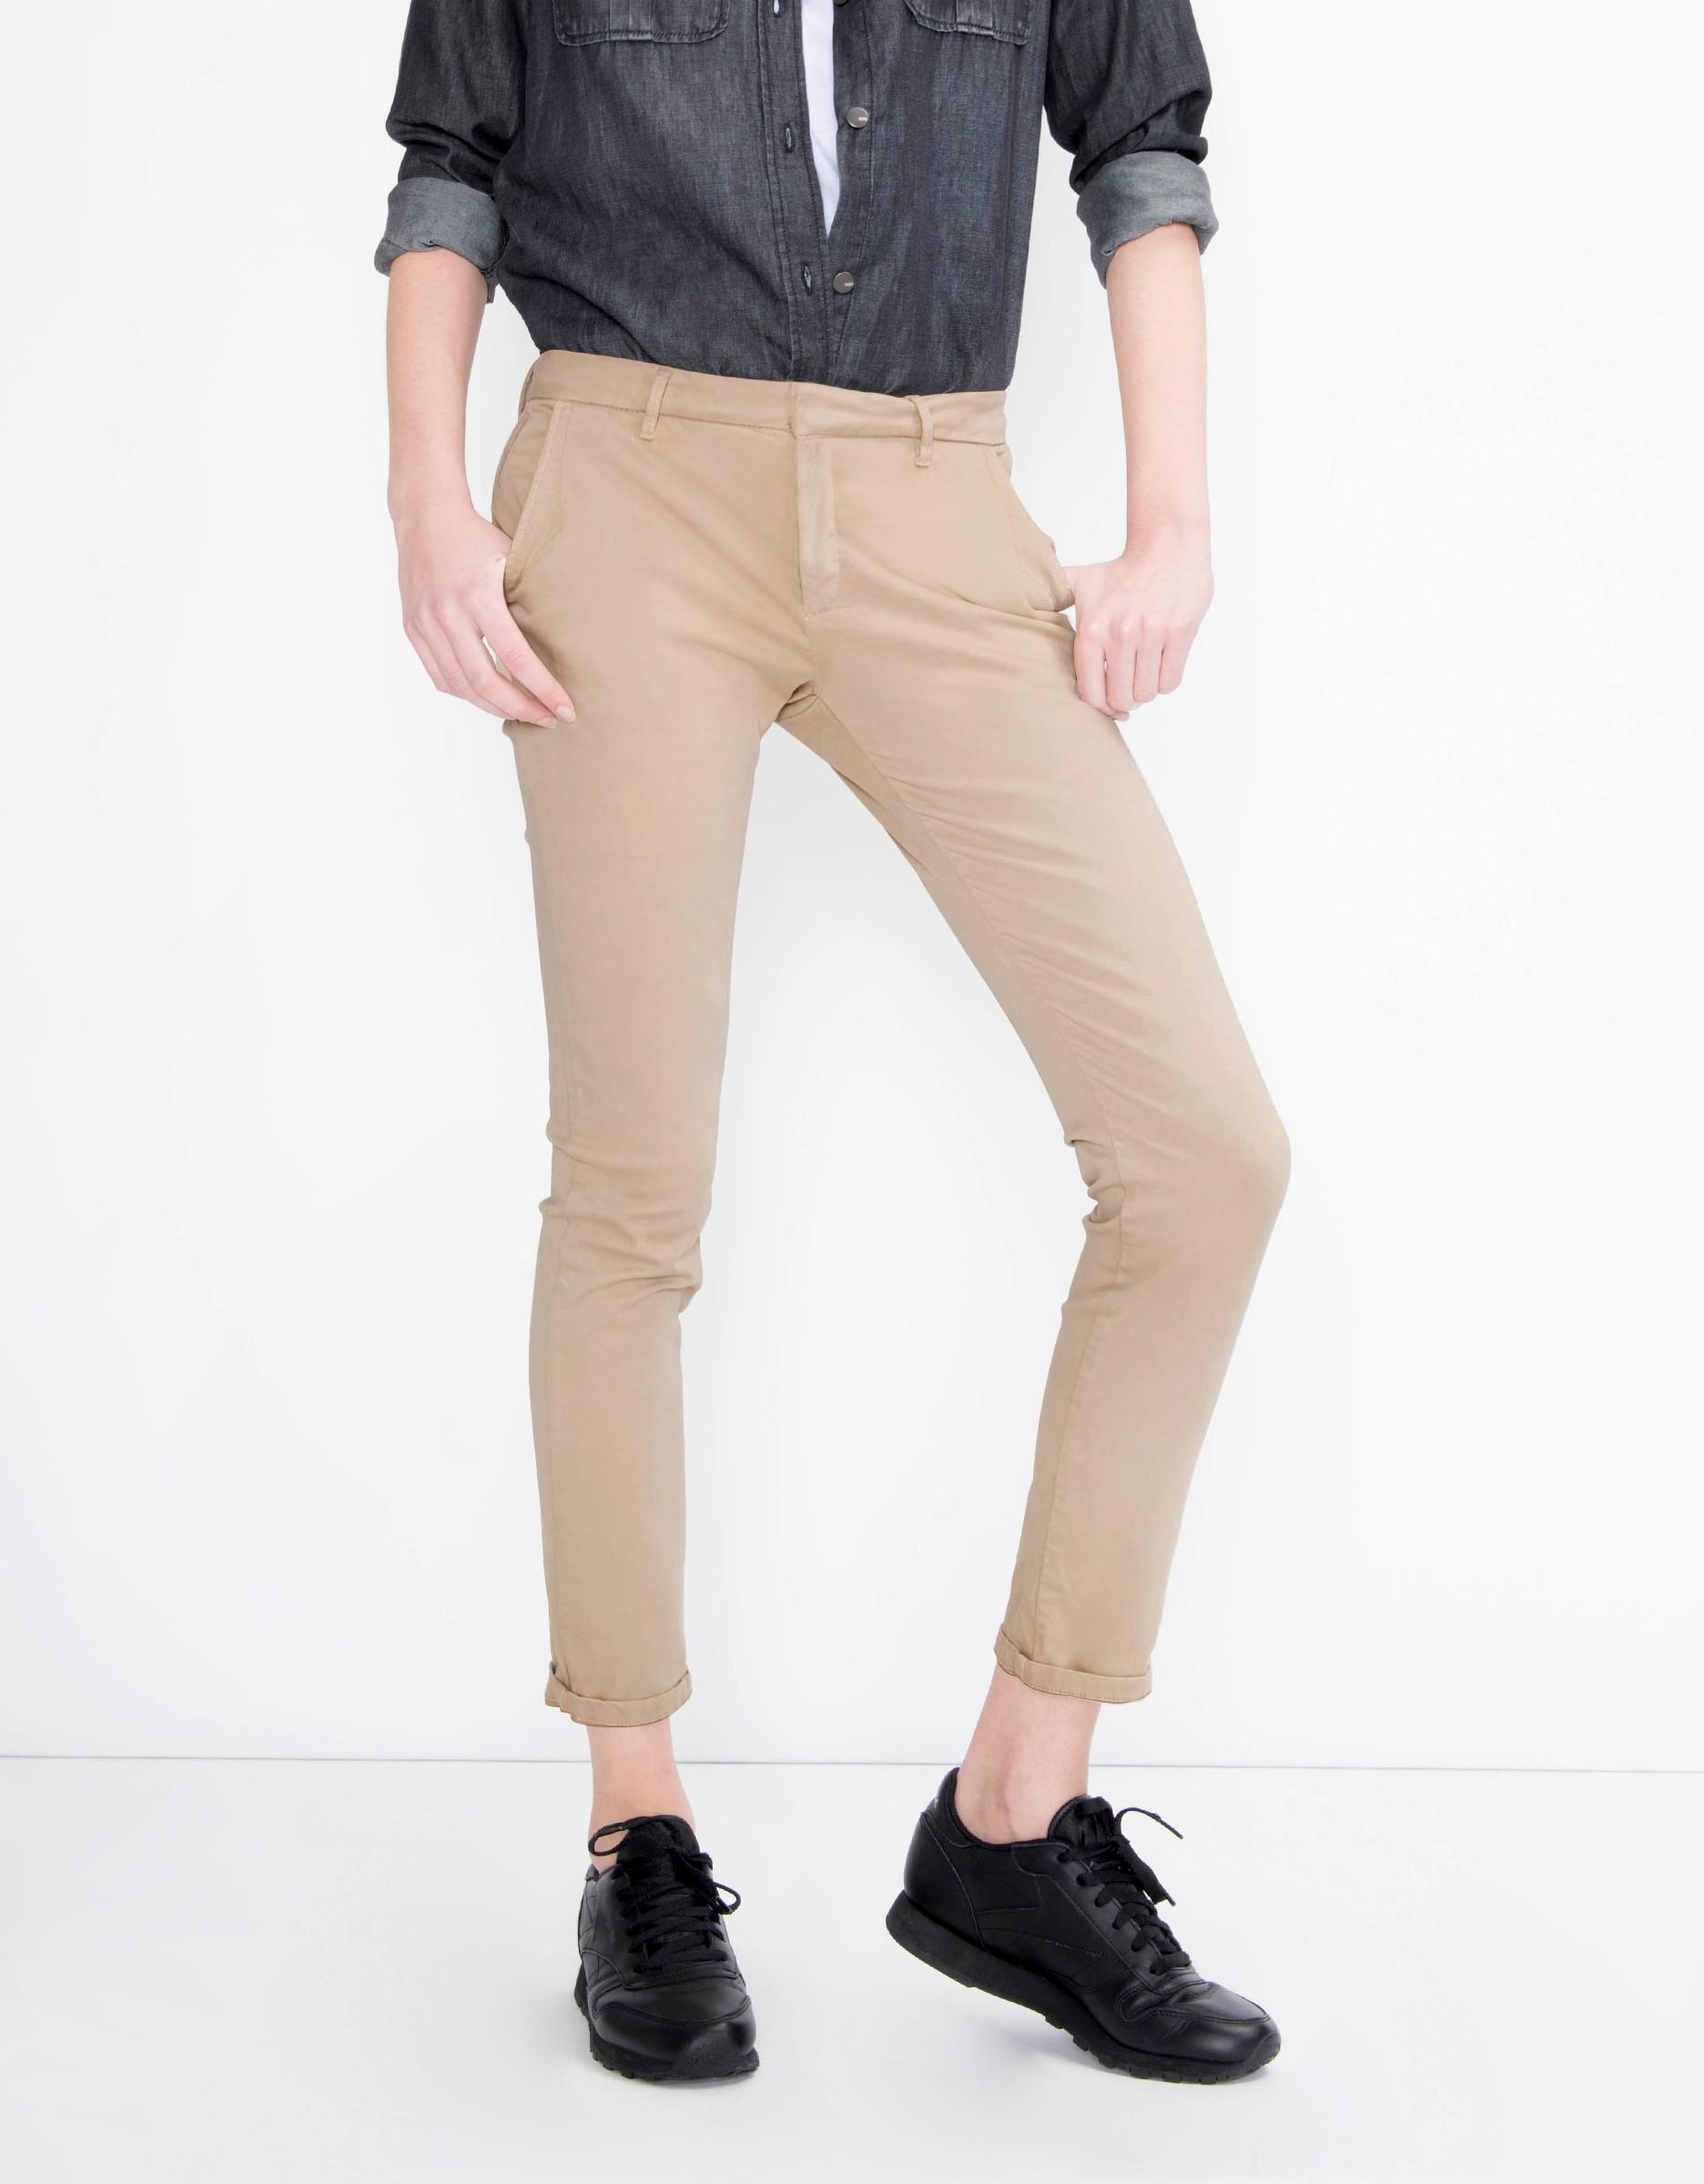 pantalon chino pour femme sandy basic beige reiko. Black Bedroom Furniture Sets. Home Design Ideas